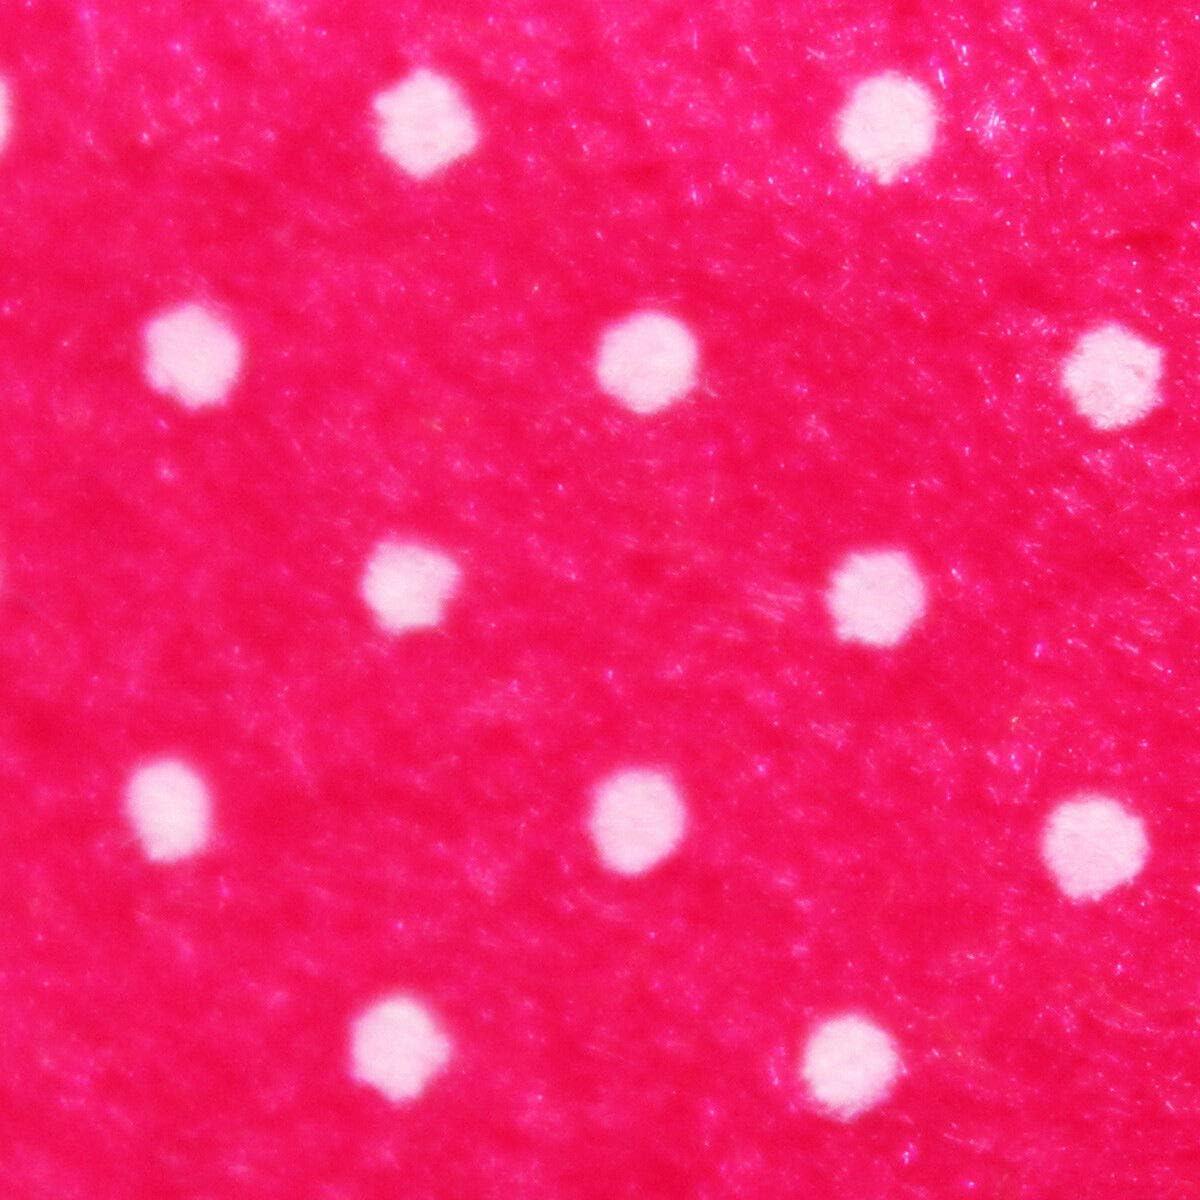 Russo Tessuti Tessuto Pannolenci Panno Lenci Fantasia Pois Punto Spillo Bianco 50 x 85 cm New-1.Rosa Confetto